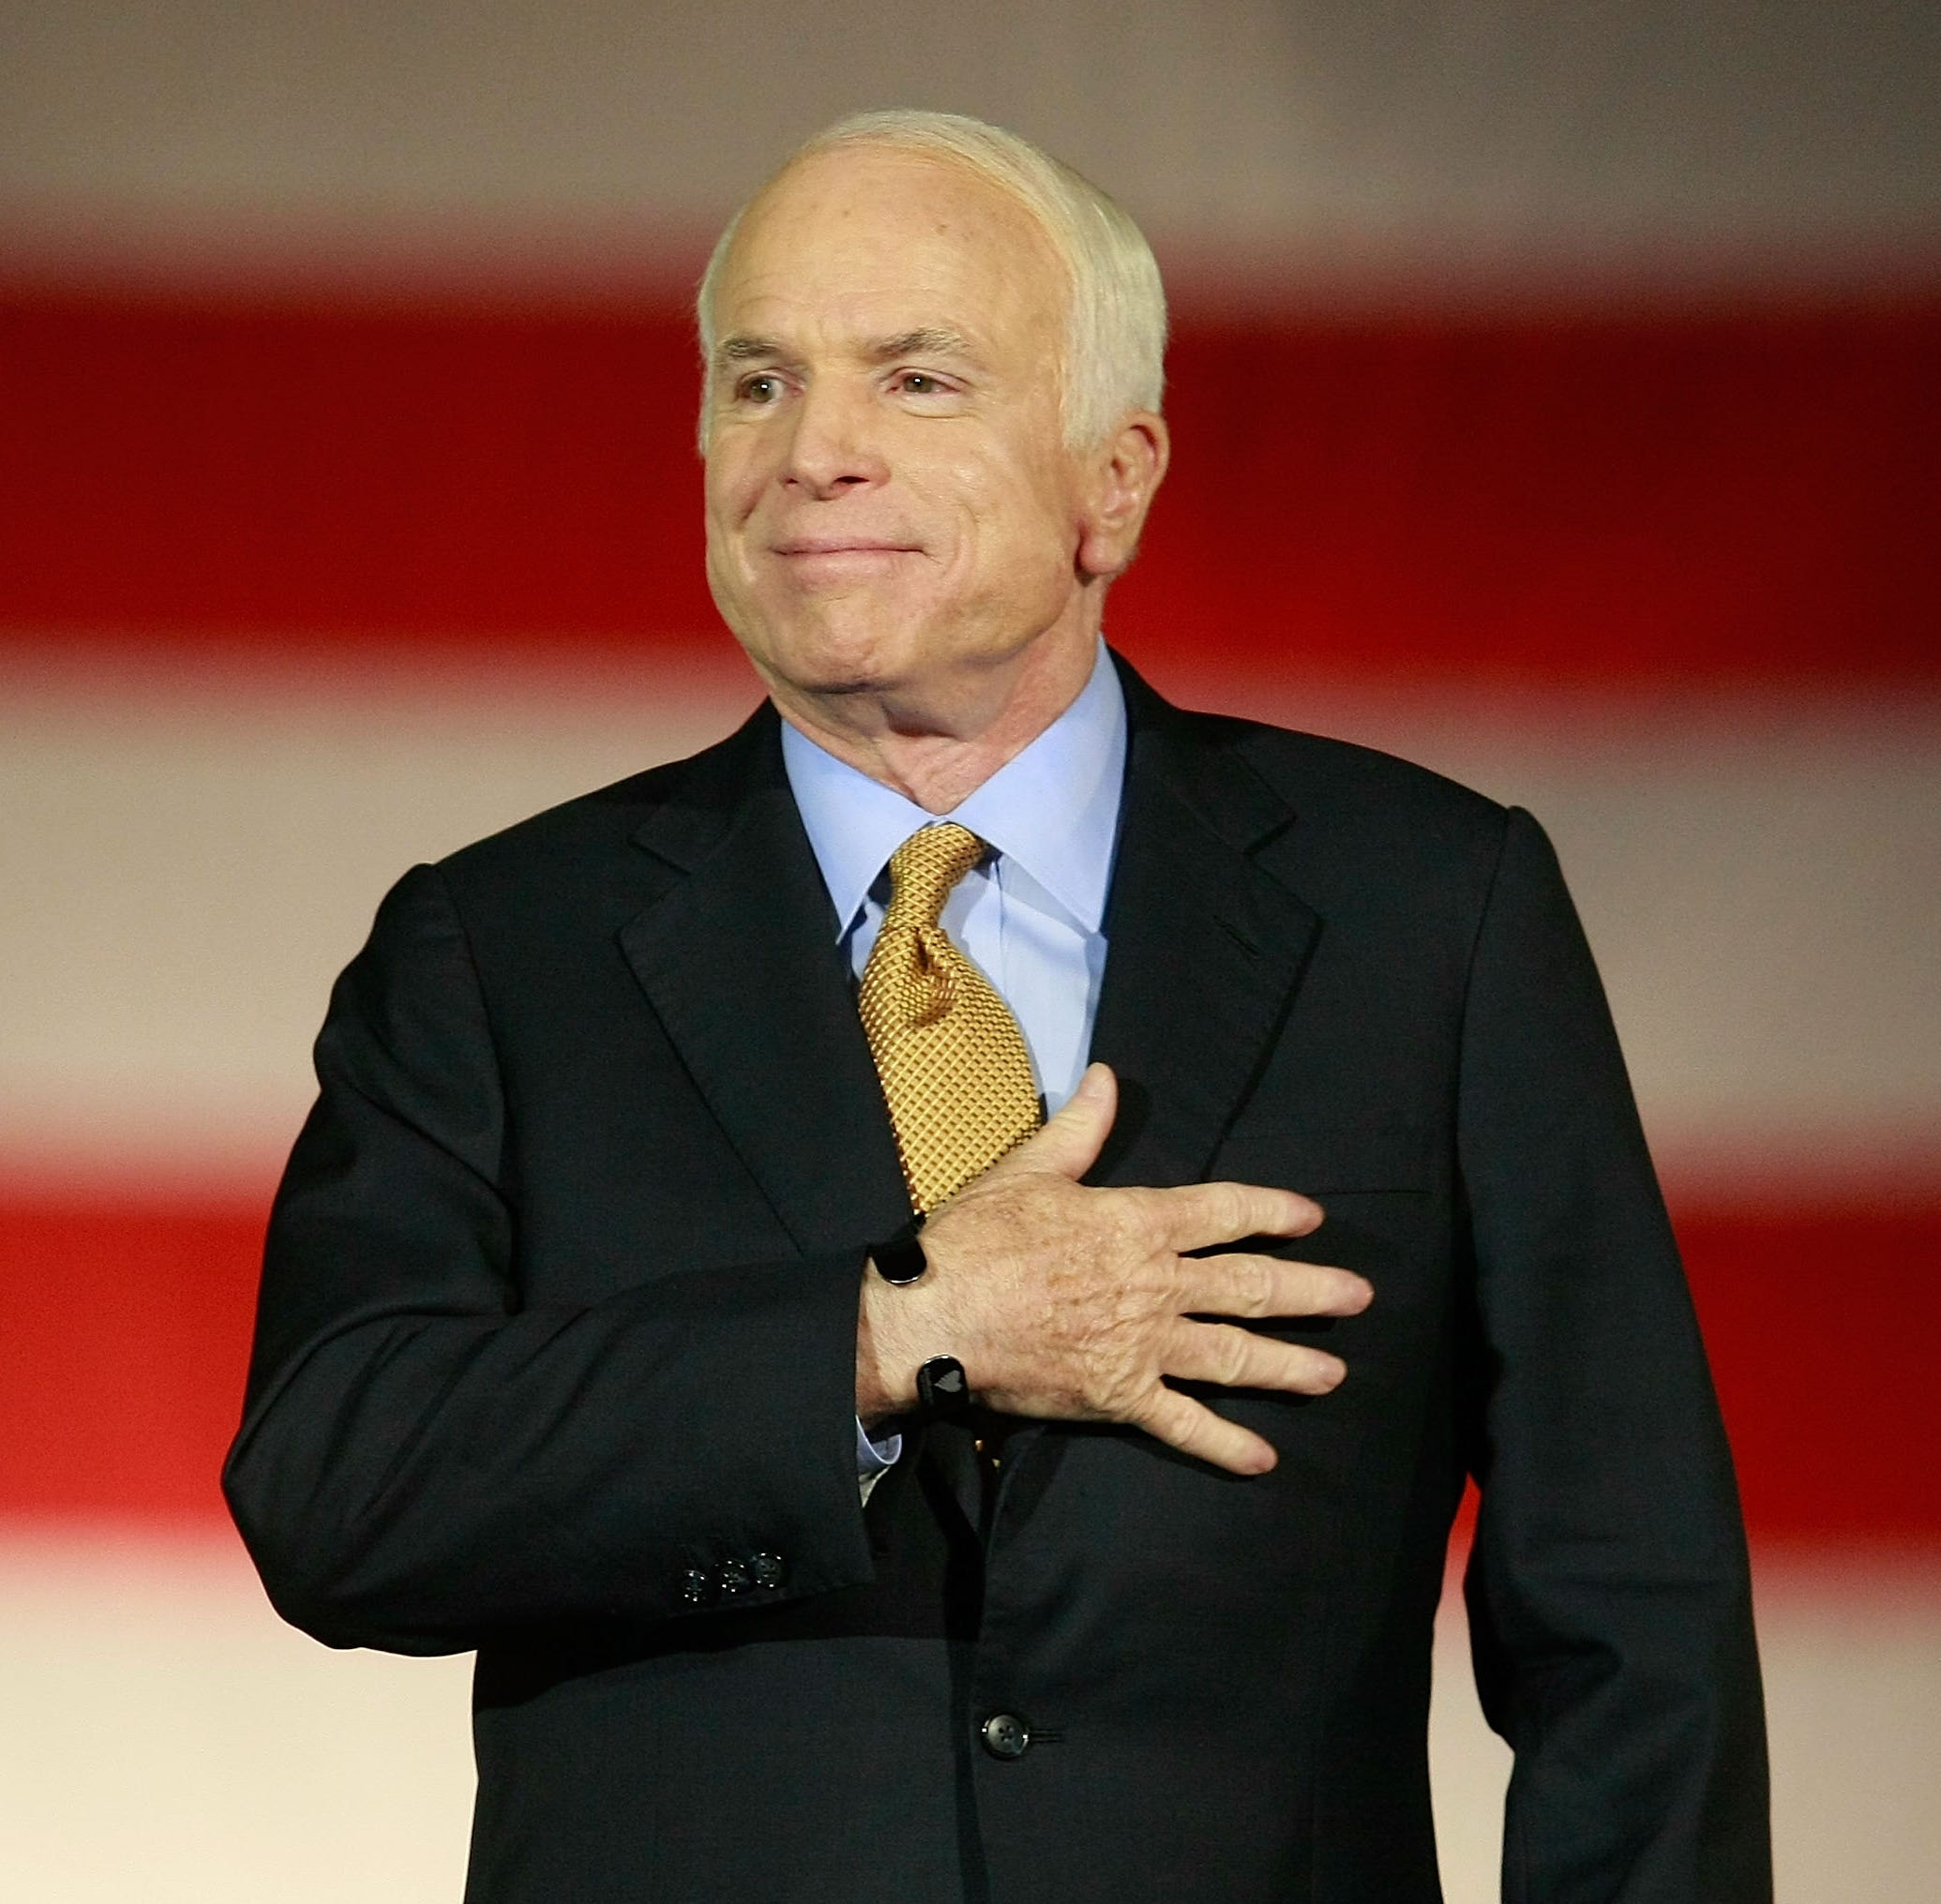 GOP uses John McCain's words in new ads hitting Democrats, despite family's misgivings